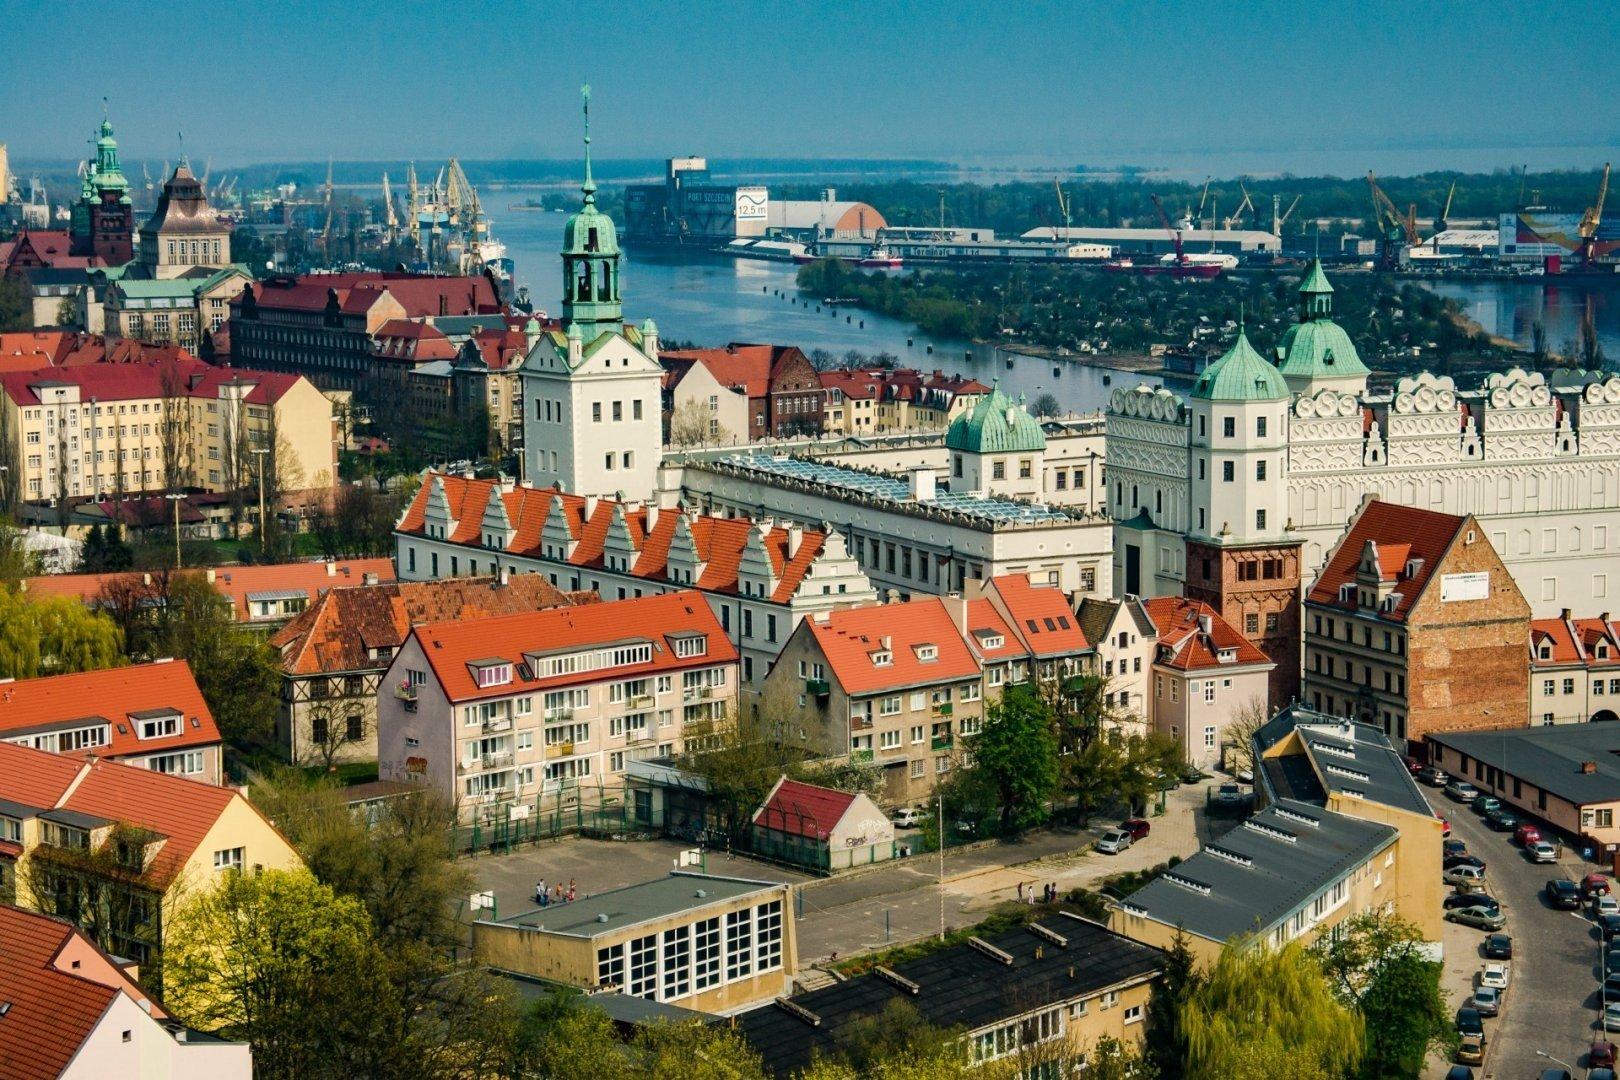 Unobvious June short break destinations by ITS DMC Poland